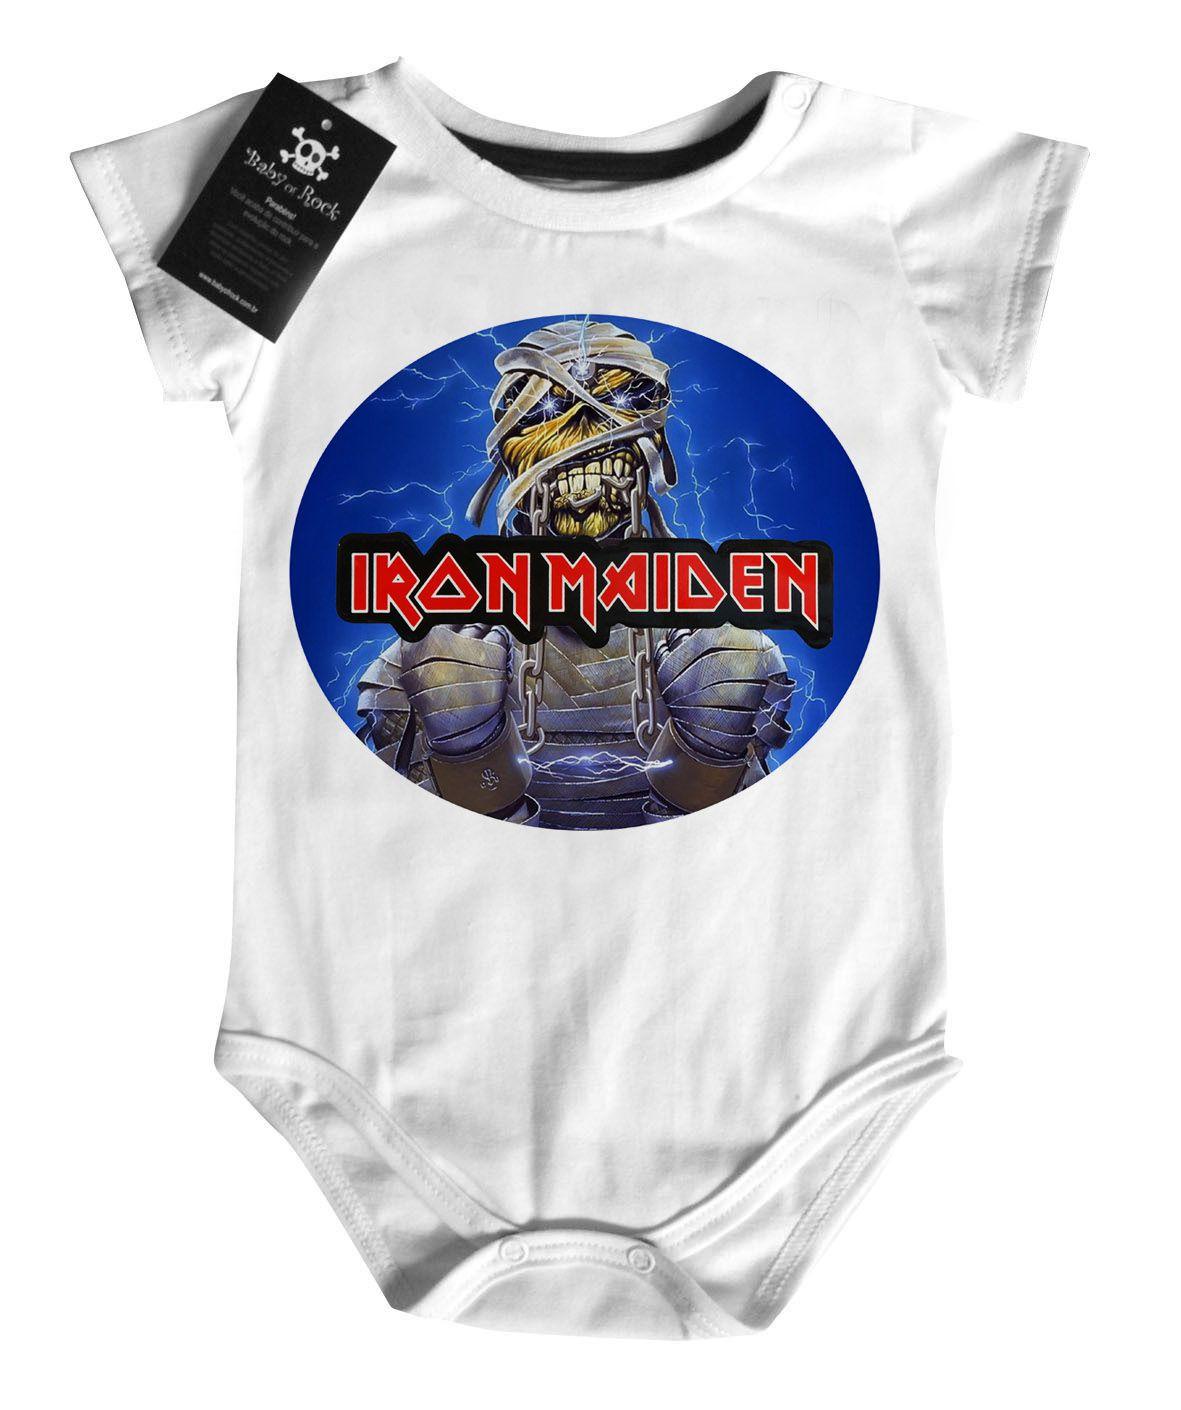 Body Bebe de Rock Iron Eddie - White  - Baby Monster S/A